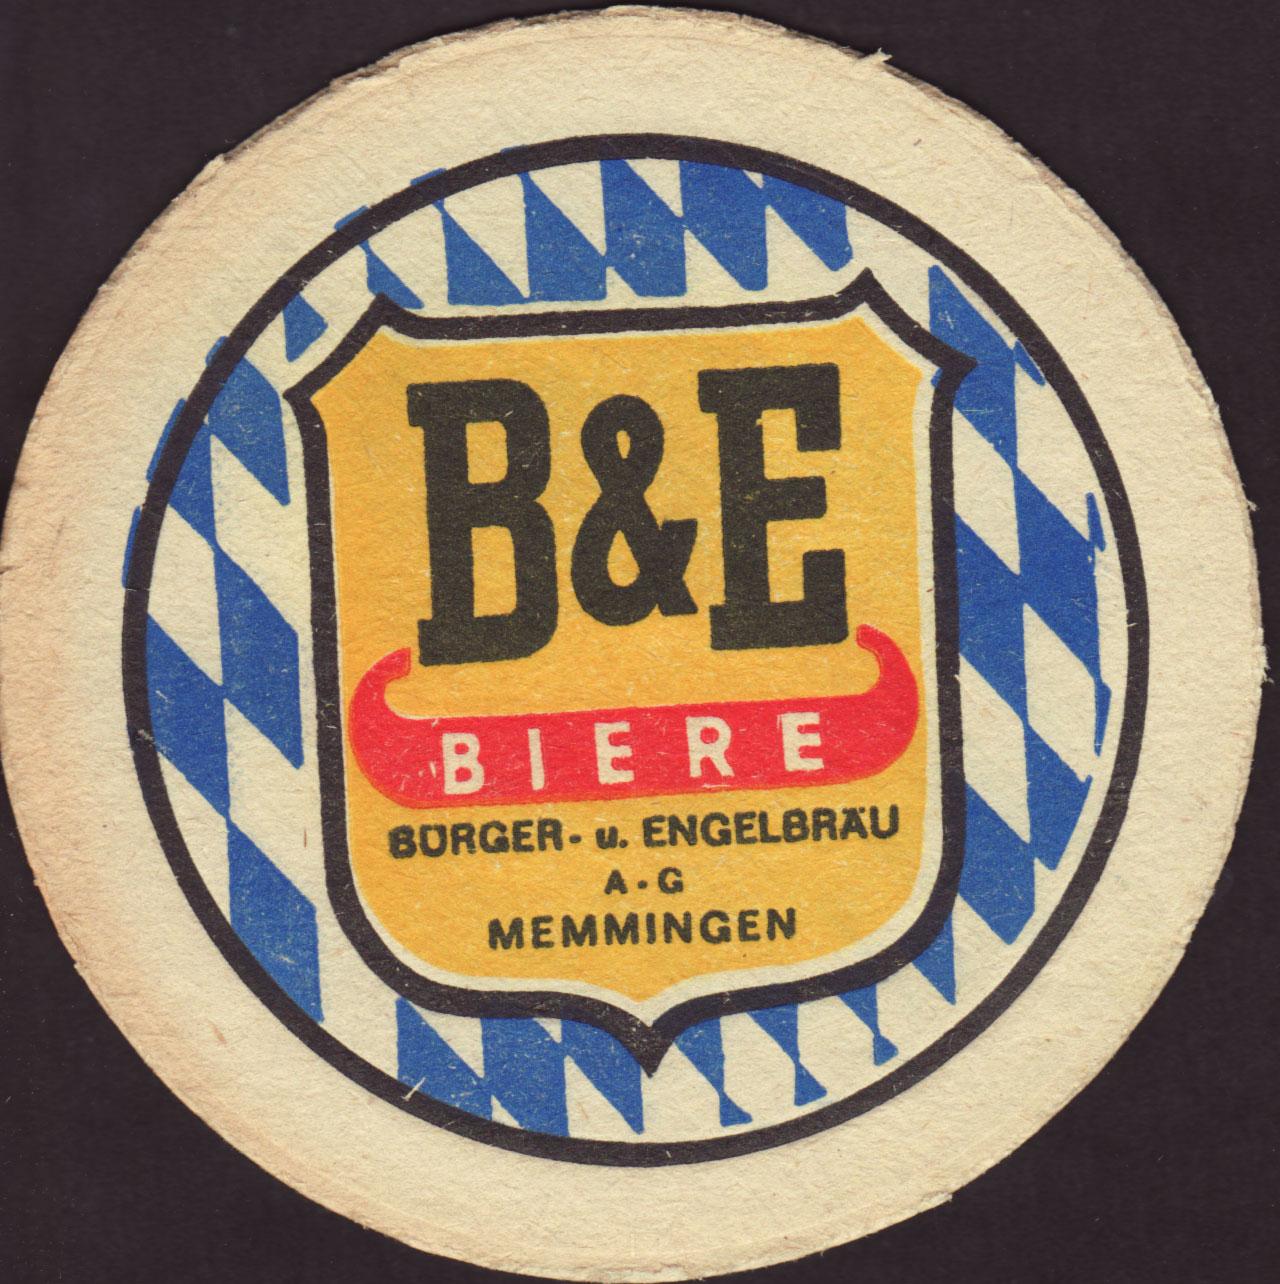 Beer Coaster Coaster Number 2 1 Brewery Memminger City